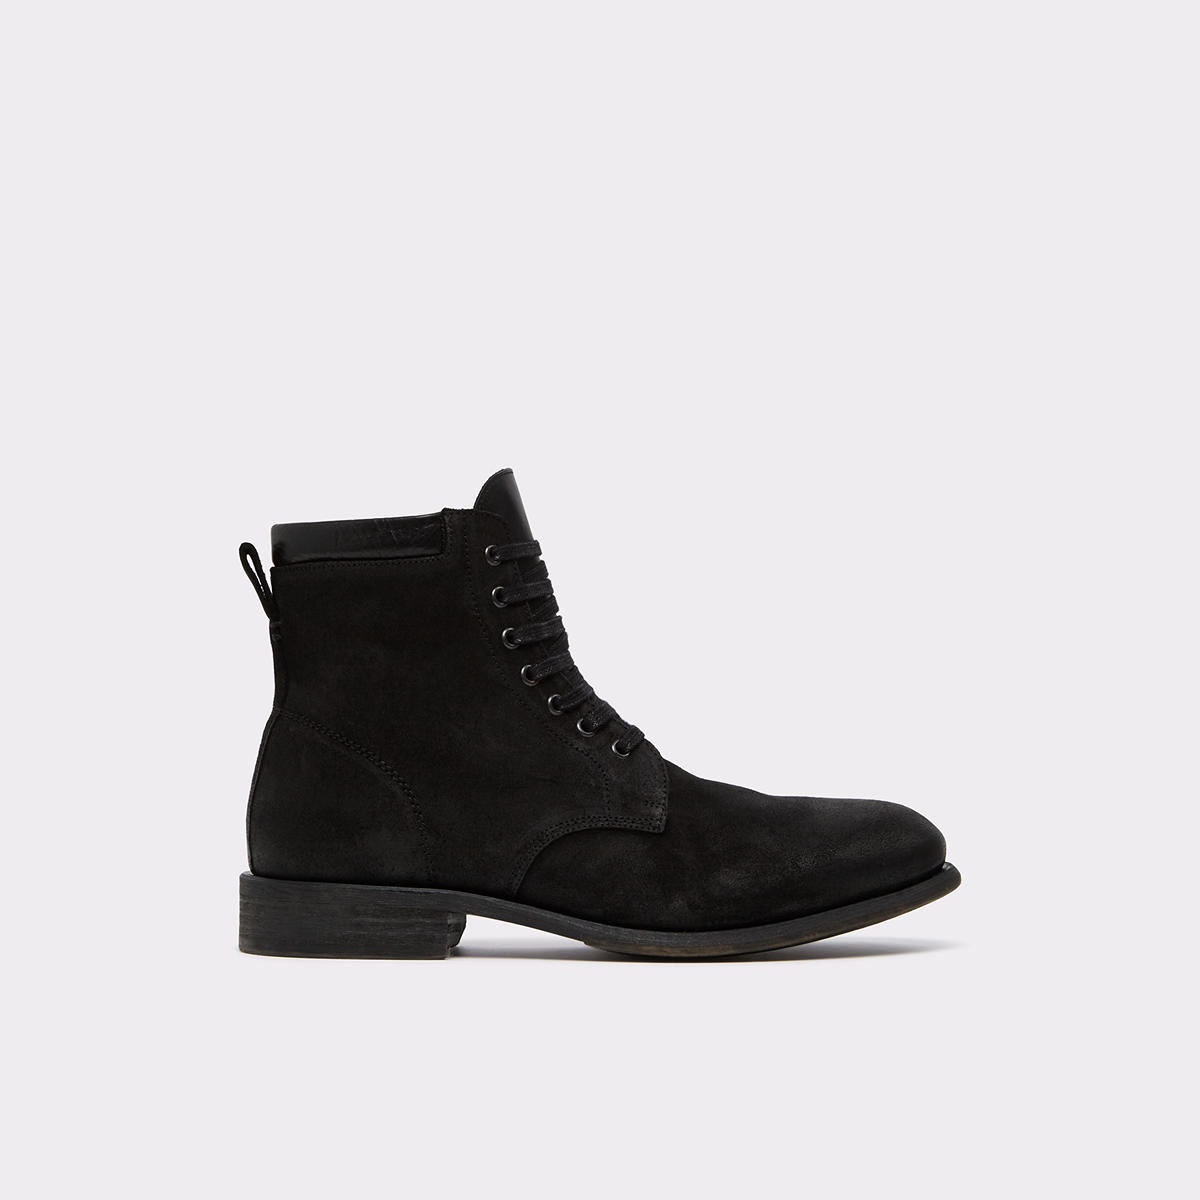 aldo shoes yorktown mall black